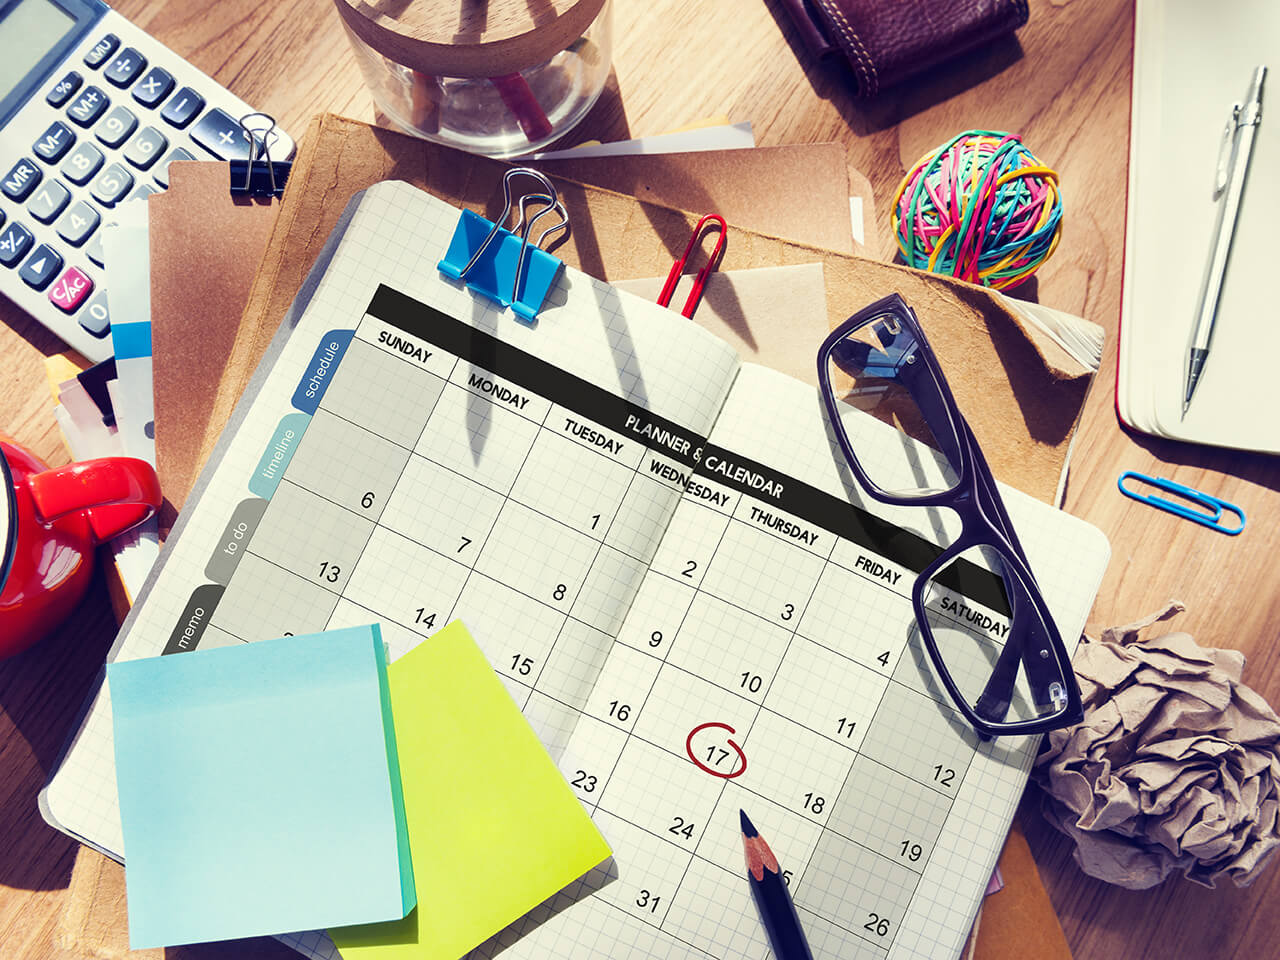 desk with a calendar